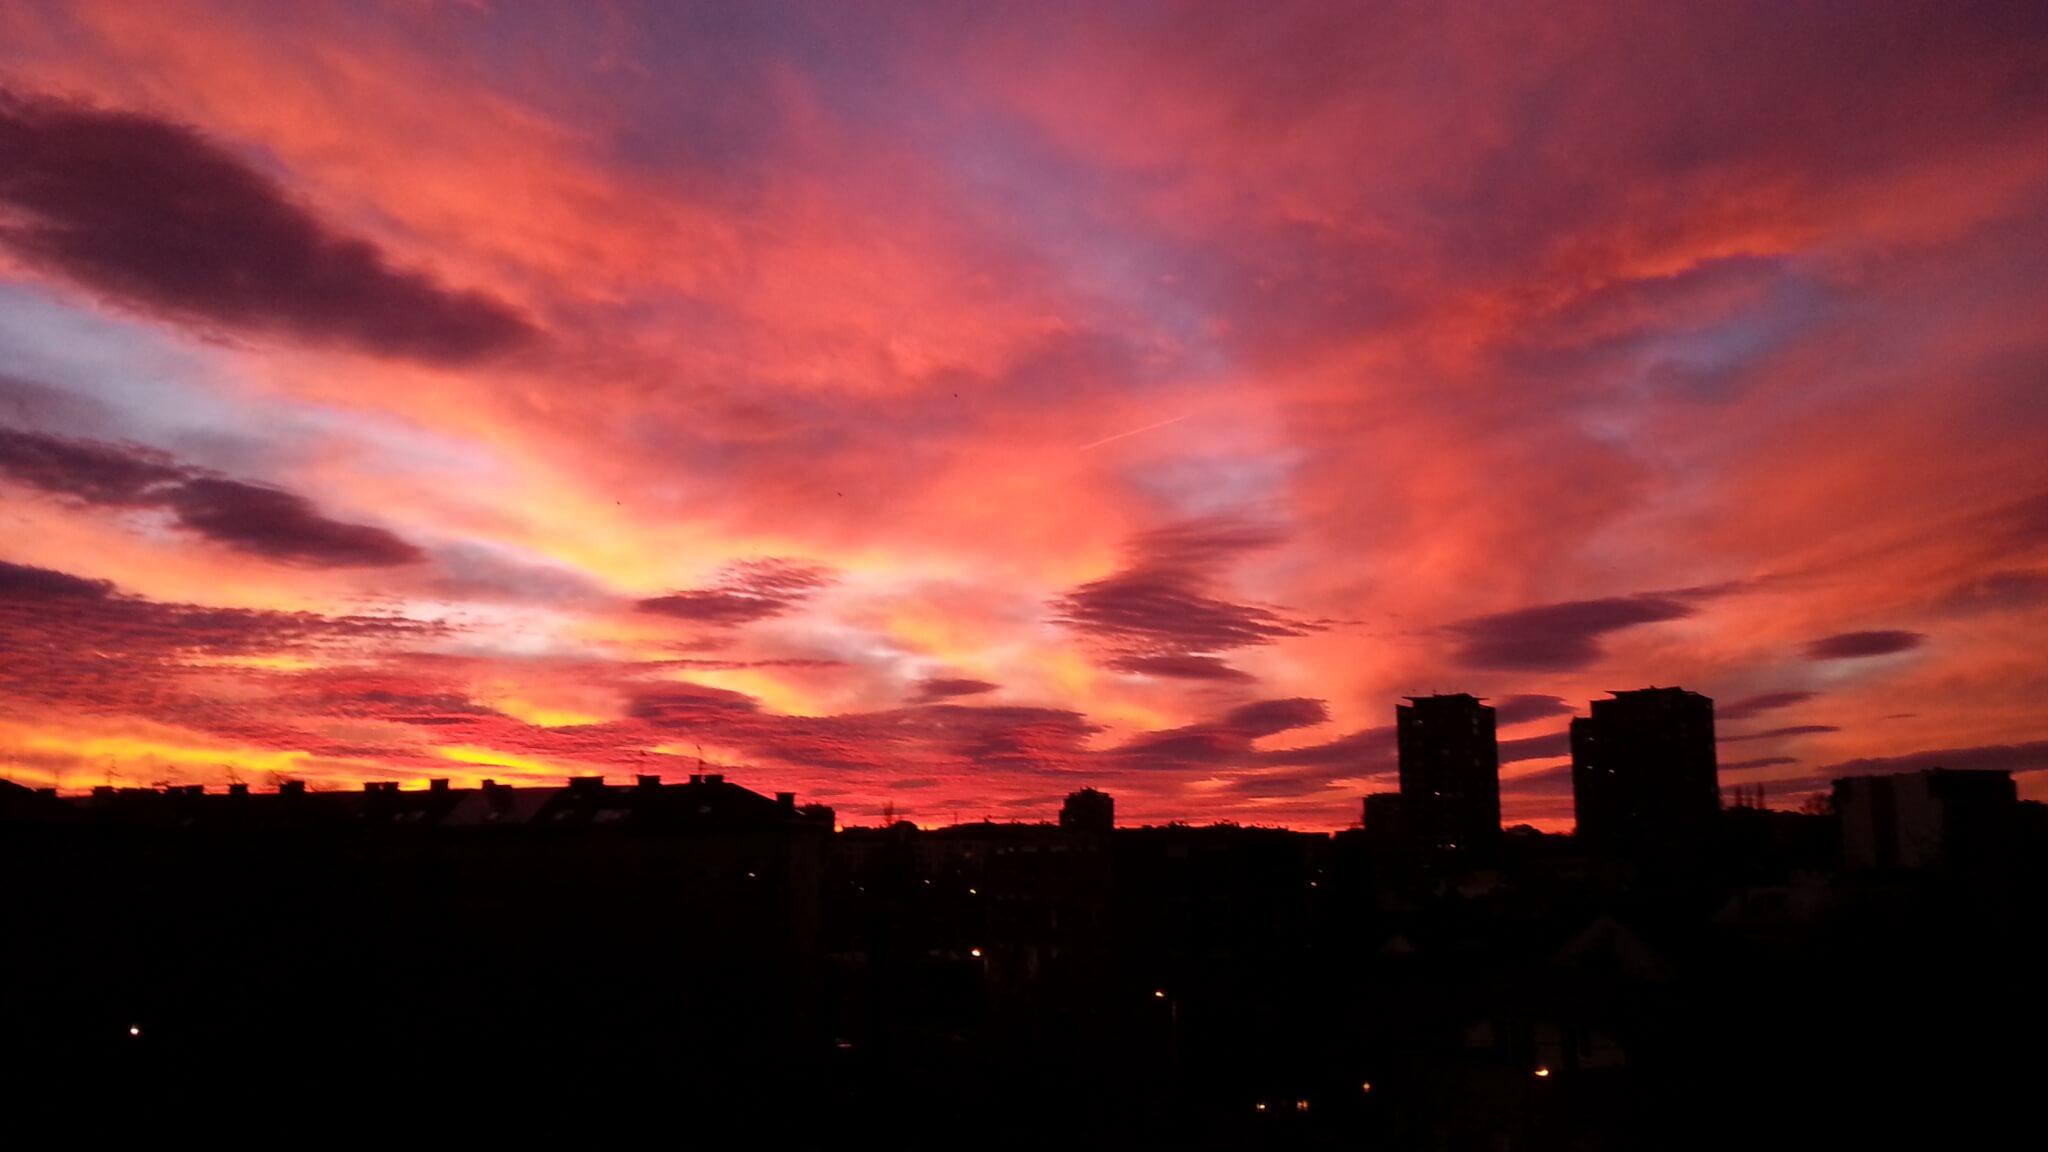 Izlazak sunca Zemun - 12. dec (Foto: Mihajlo Tomić)